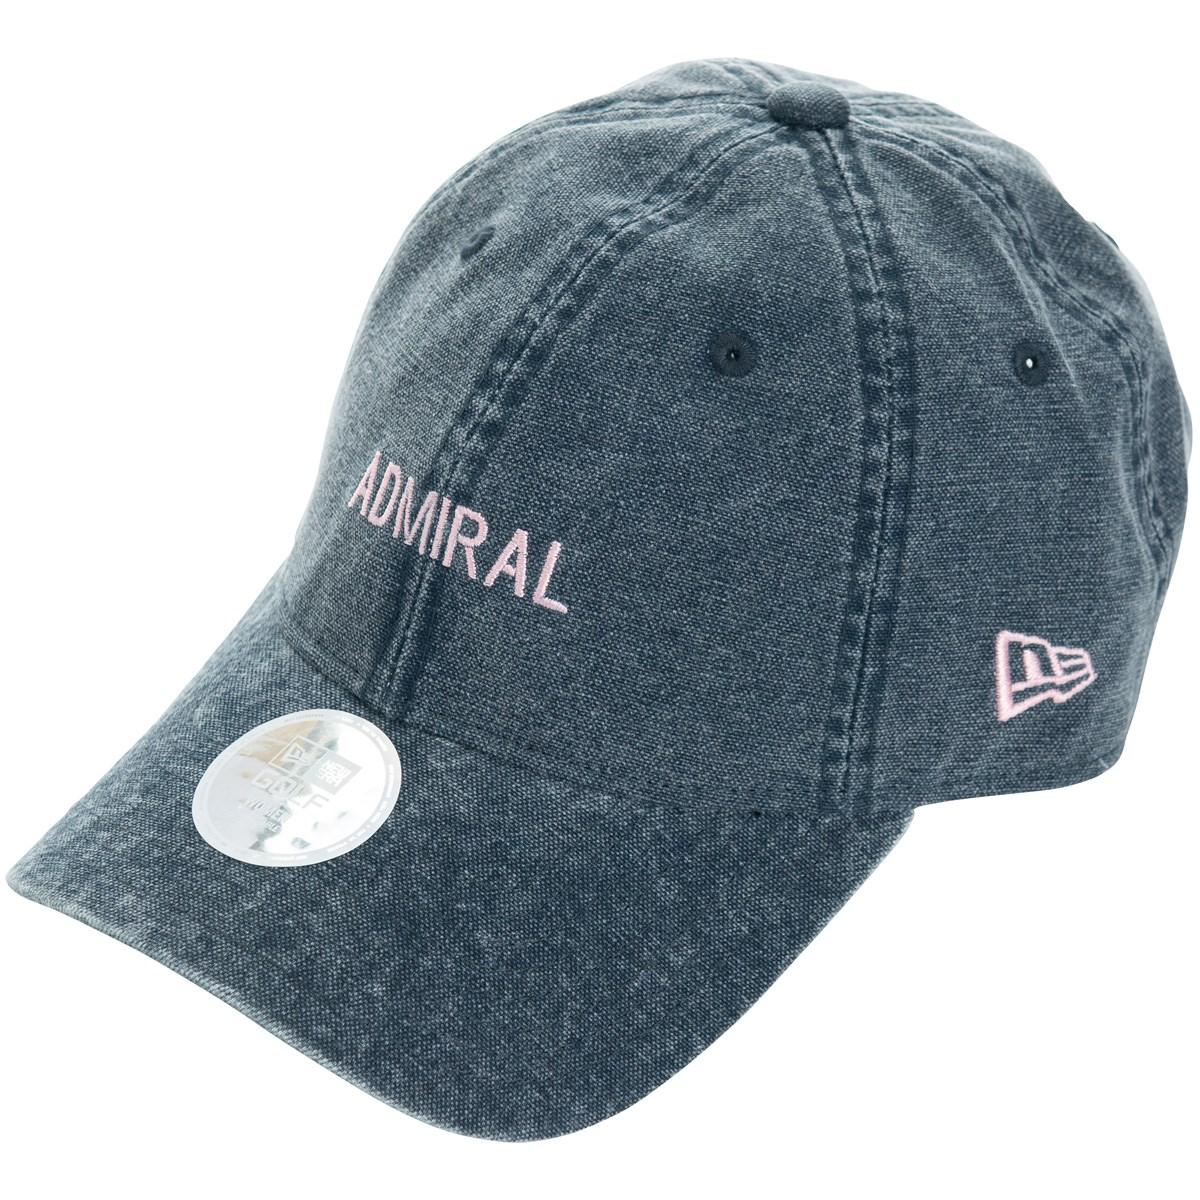 90fff2eac6031 衣装 NY NEW ERA SNAPBACK CAP 9FIFTY スナップバック ペアルック キャップ キッズ メンズ ニューエラー 男女兼用 親子  帽子 ...